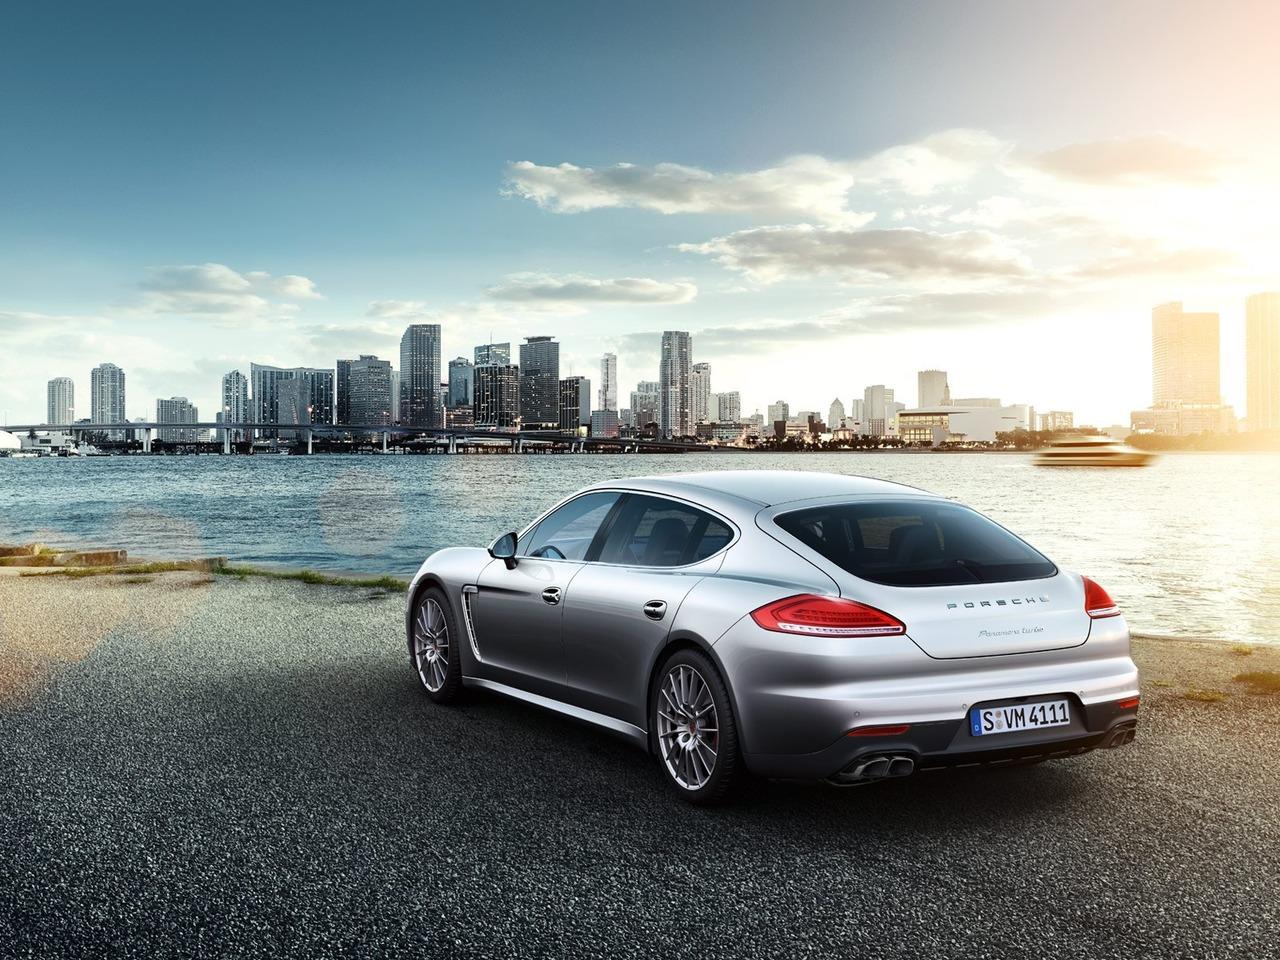 Снимки: Porsche Panamera Facelift